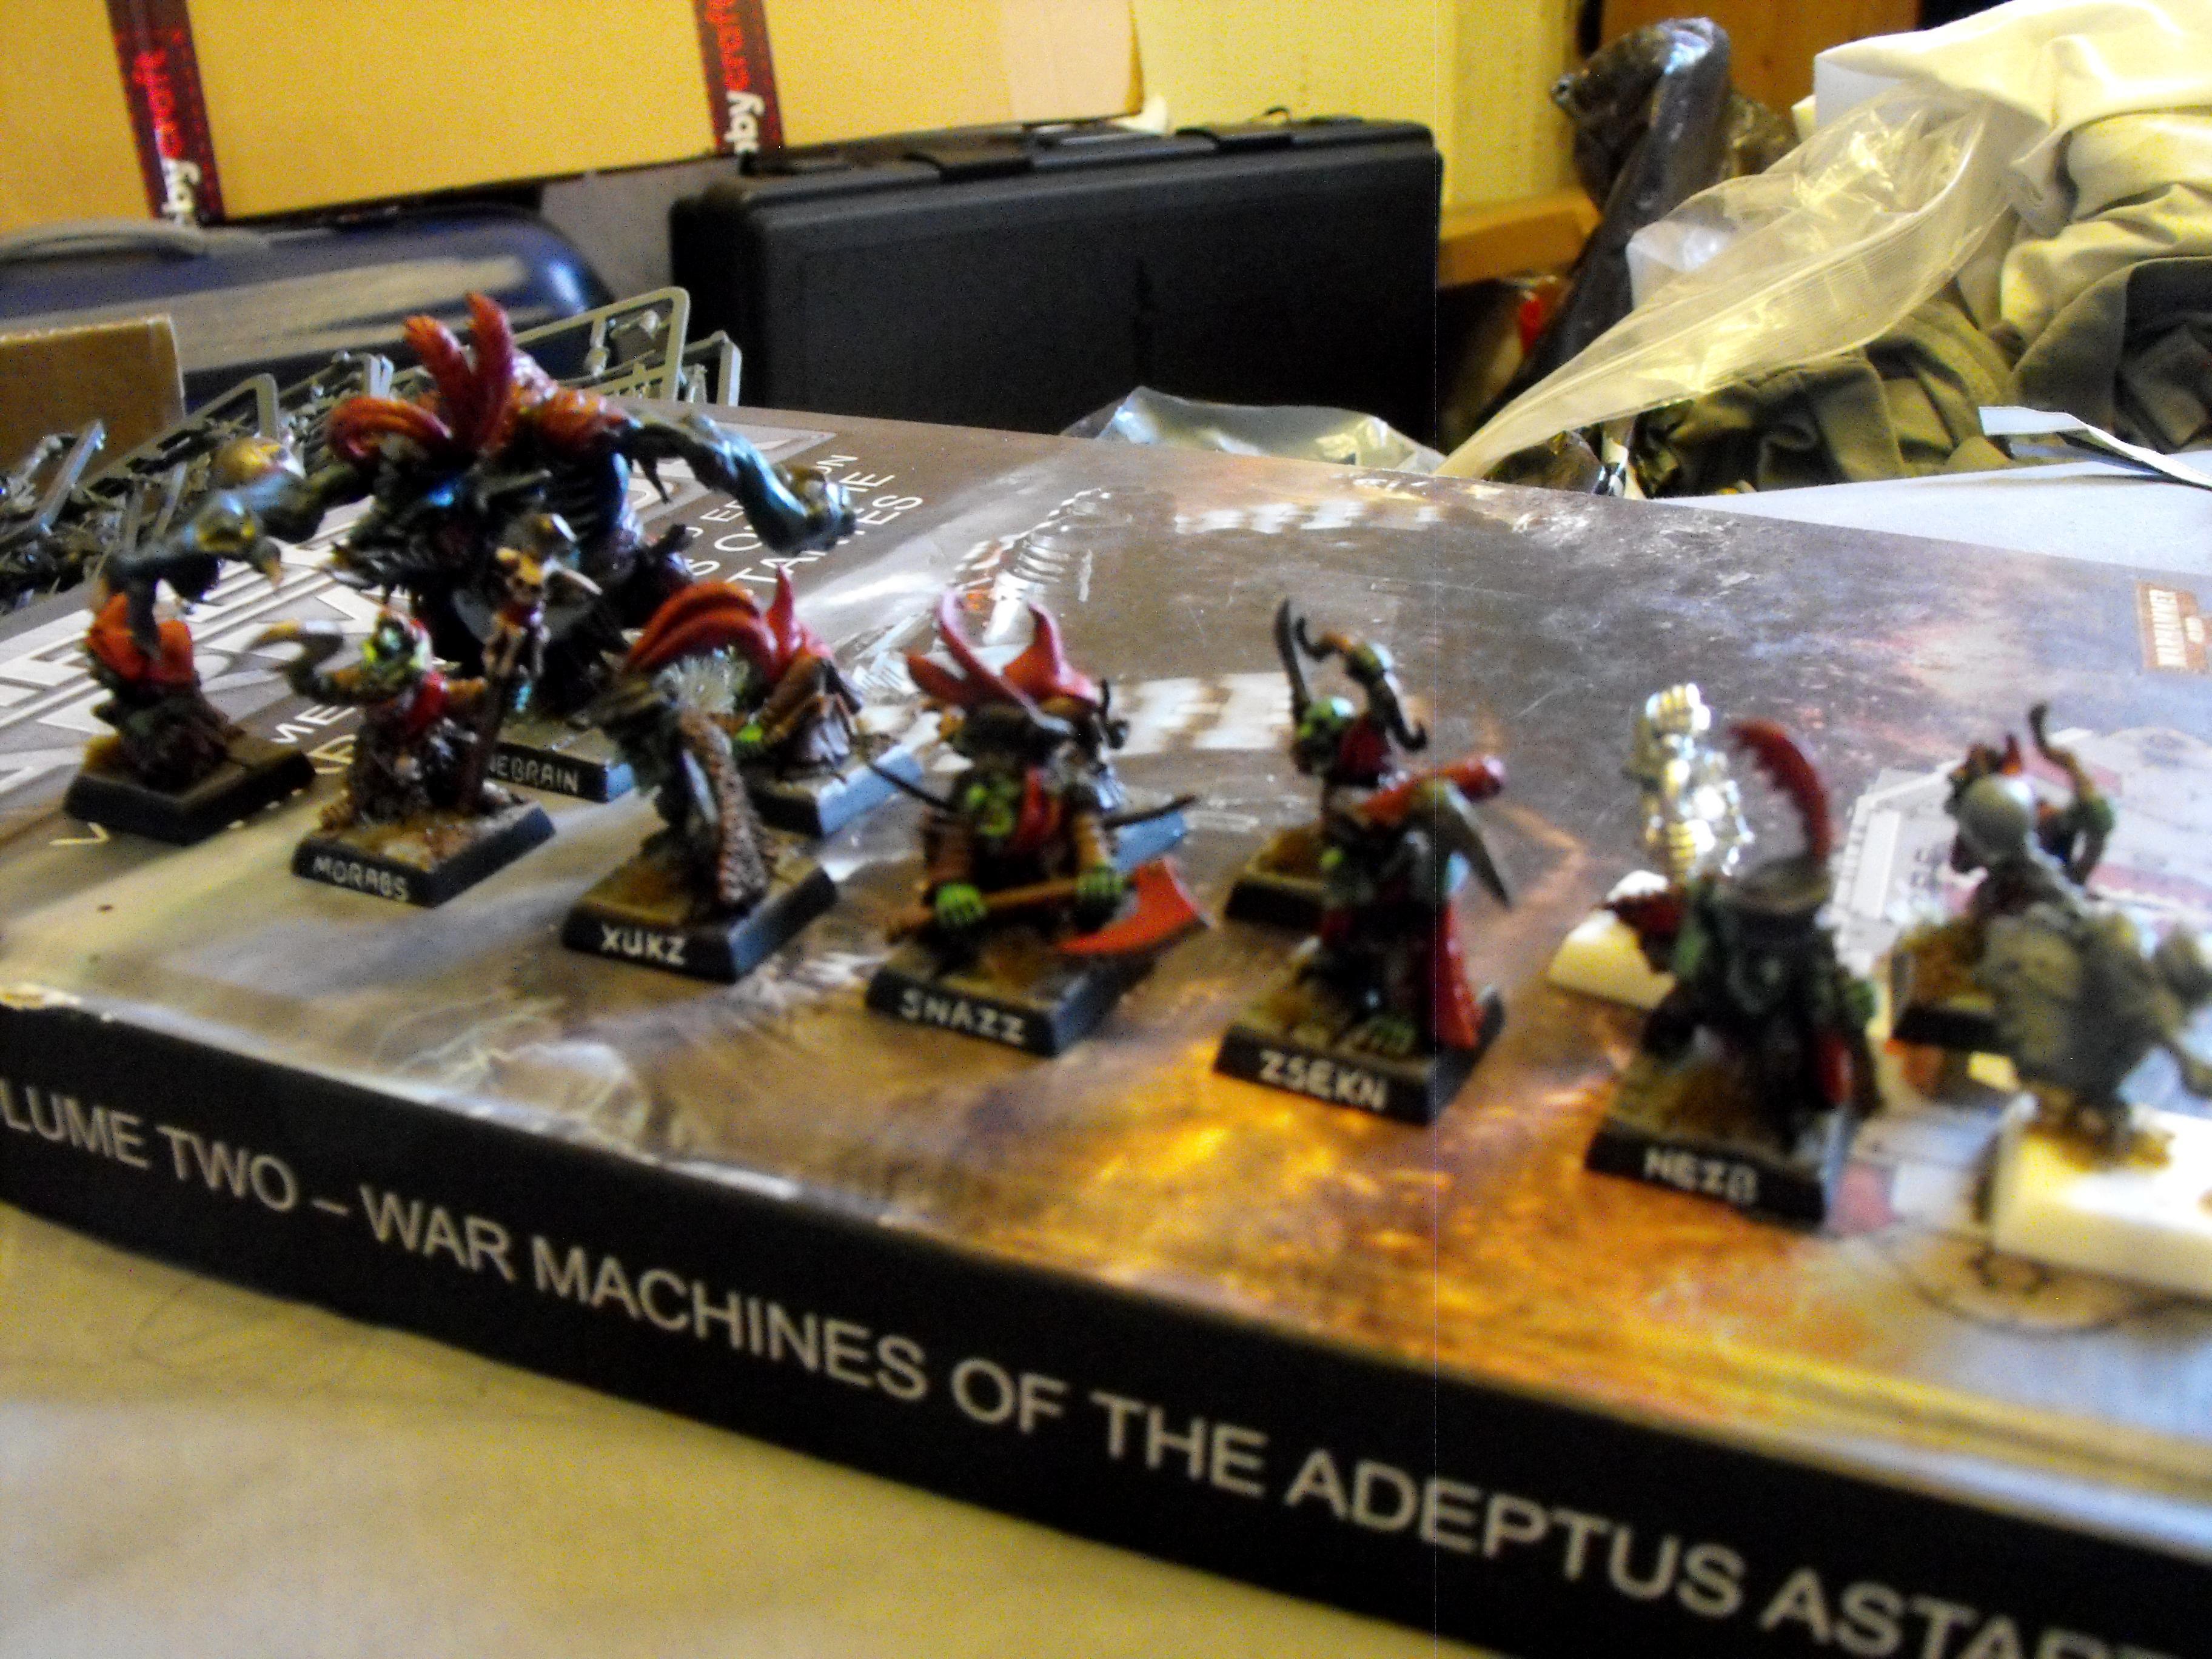 Coreheim, Goblins, Hats, Mordheim, Night Goblins, Troll